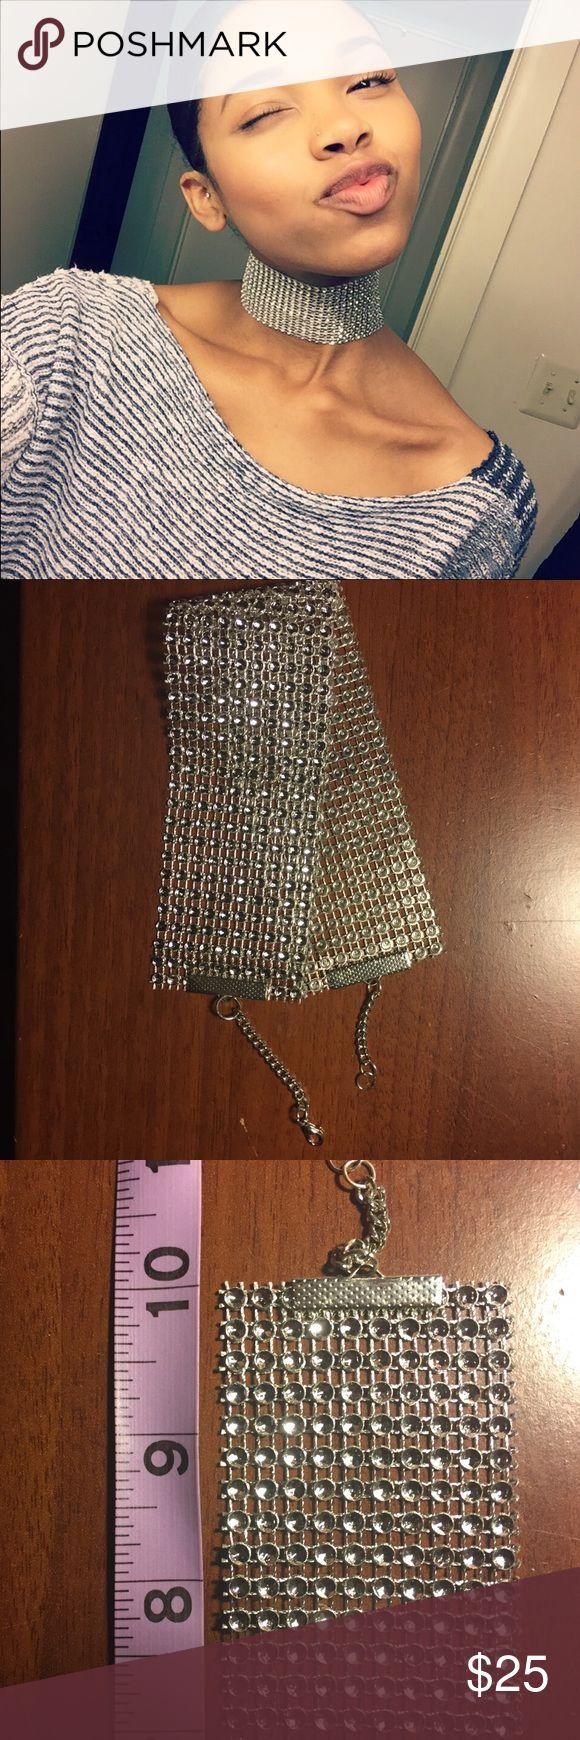 Diamond choker necklace Handmade diamond choker, great piece to spice up any outfit! Handmade Jewelry Necklaces